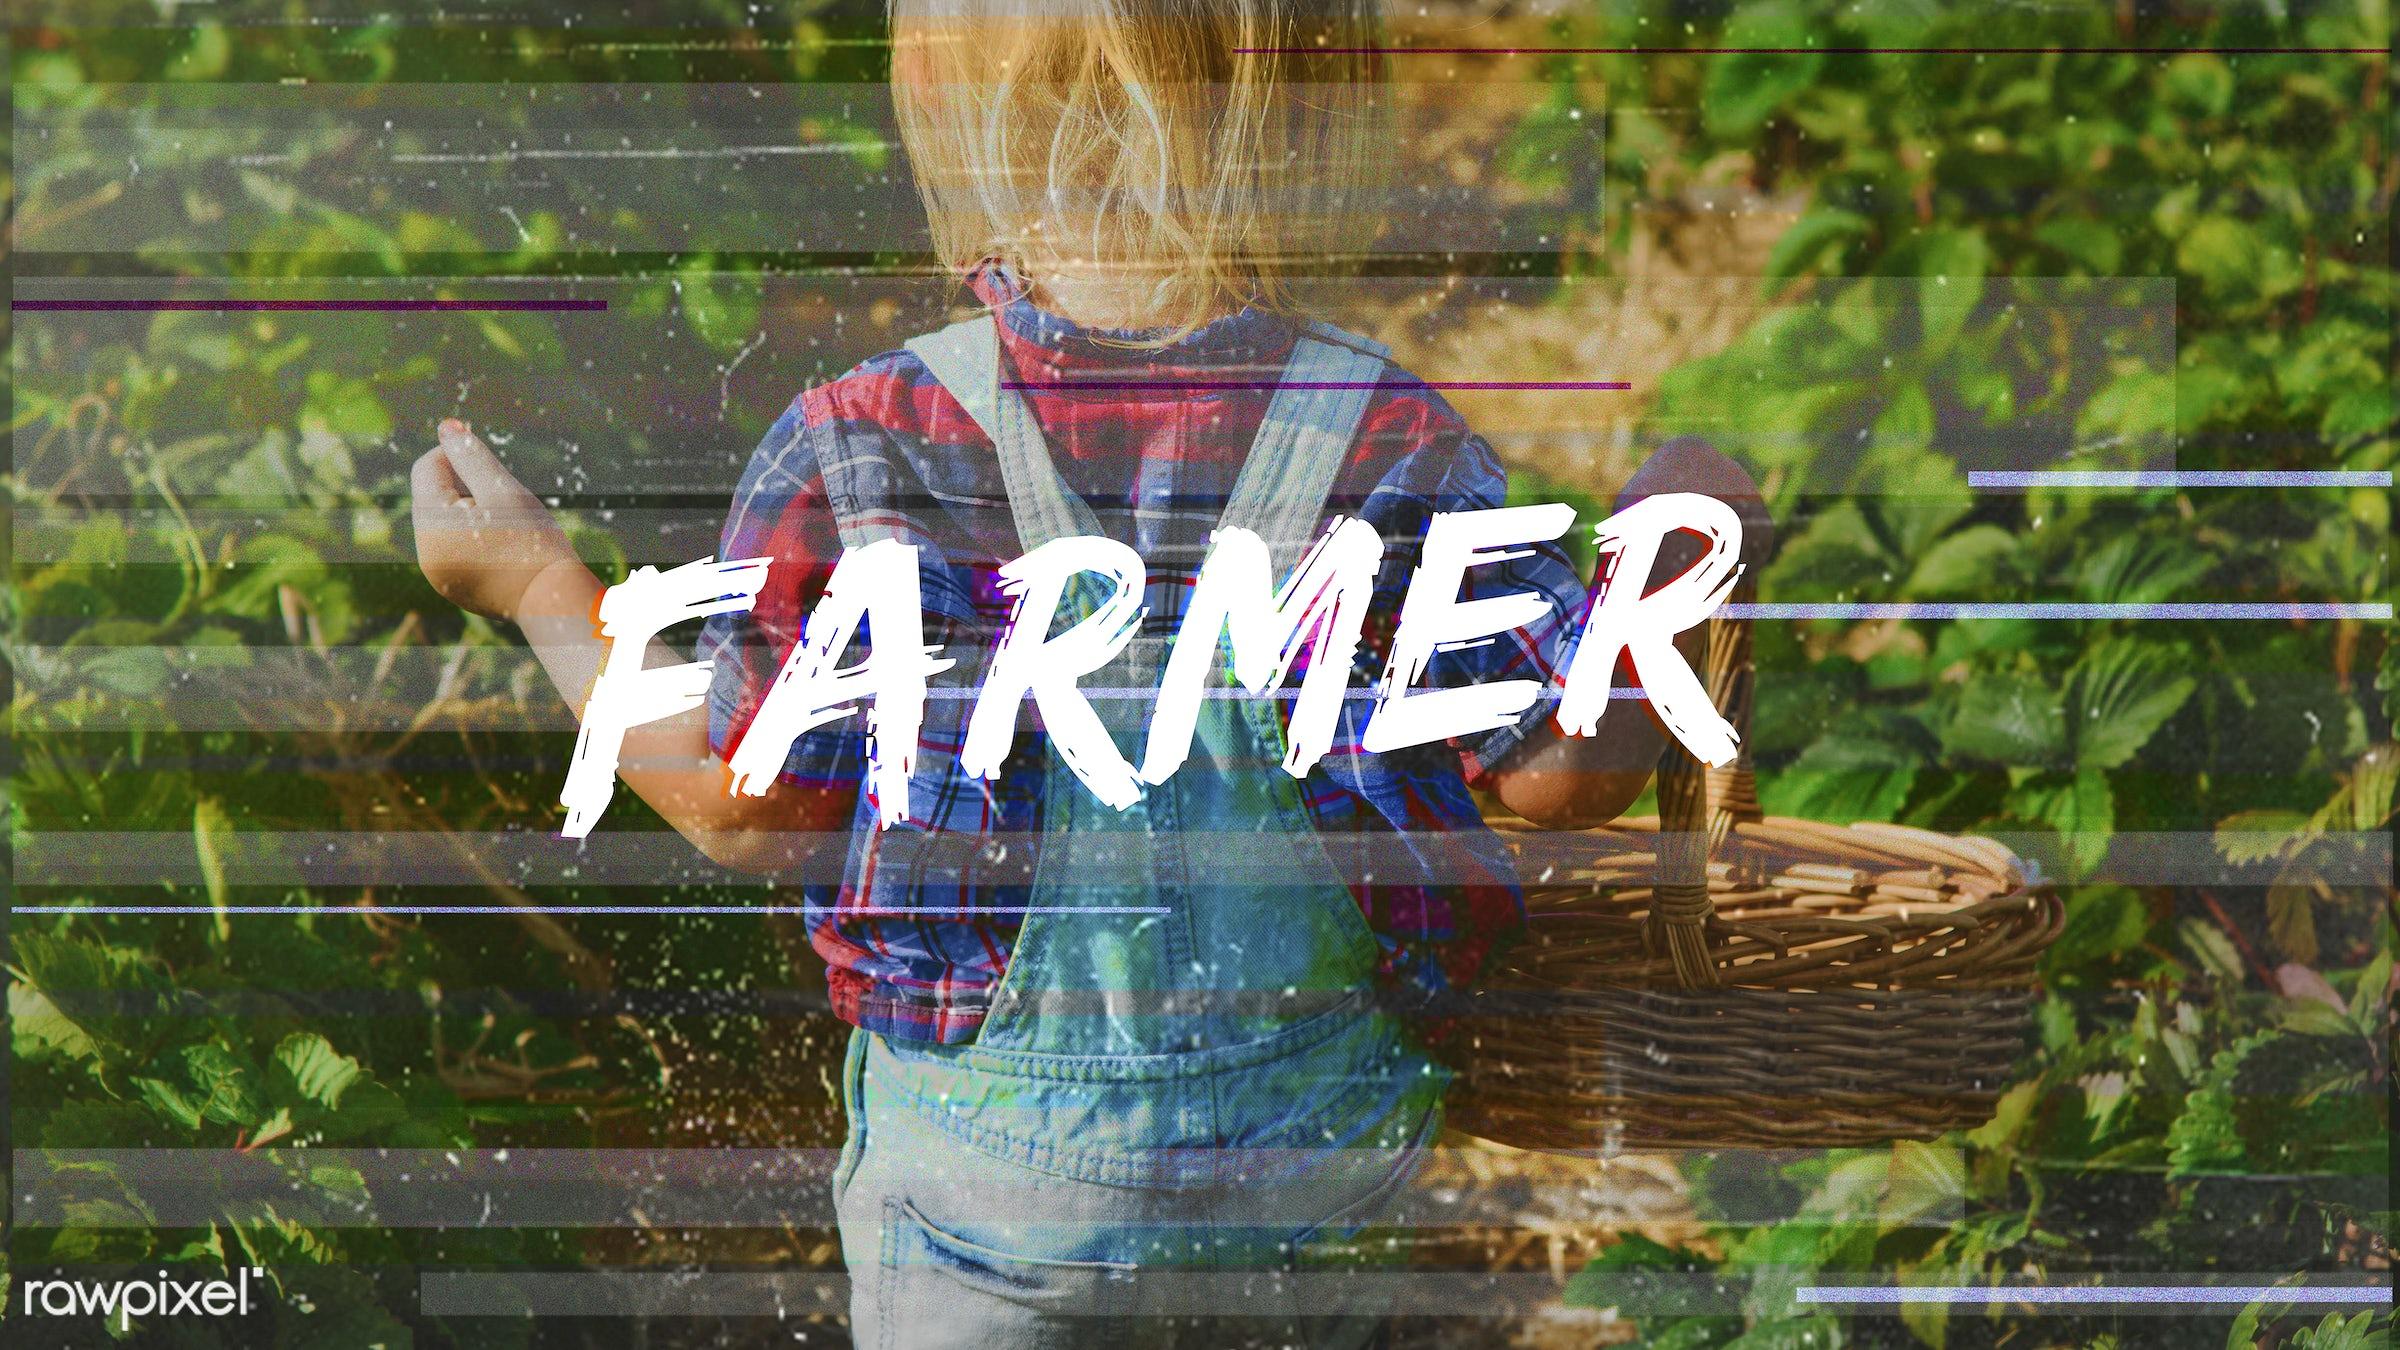 strawberry, basket, blonde, boy, caucasian, dungarees, eco, ecology, environment, environmental, farm, farmer, farming,...